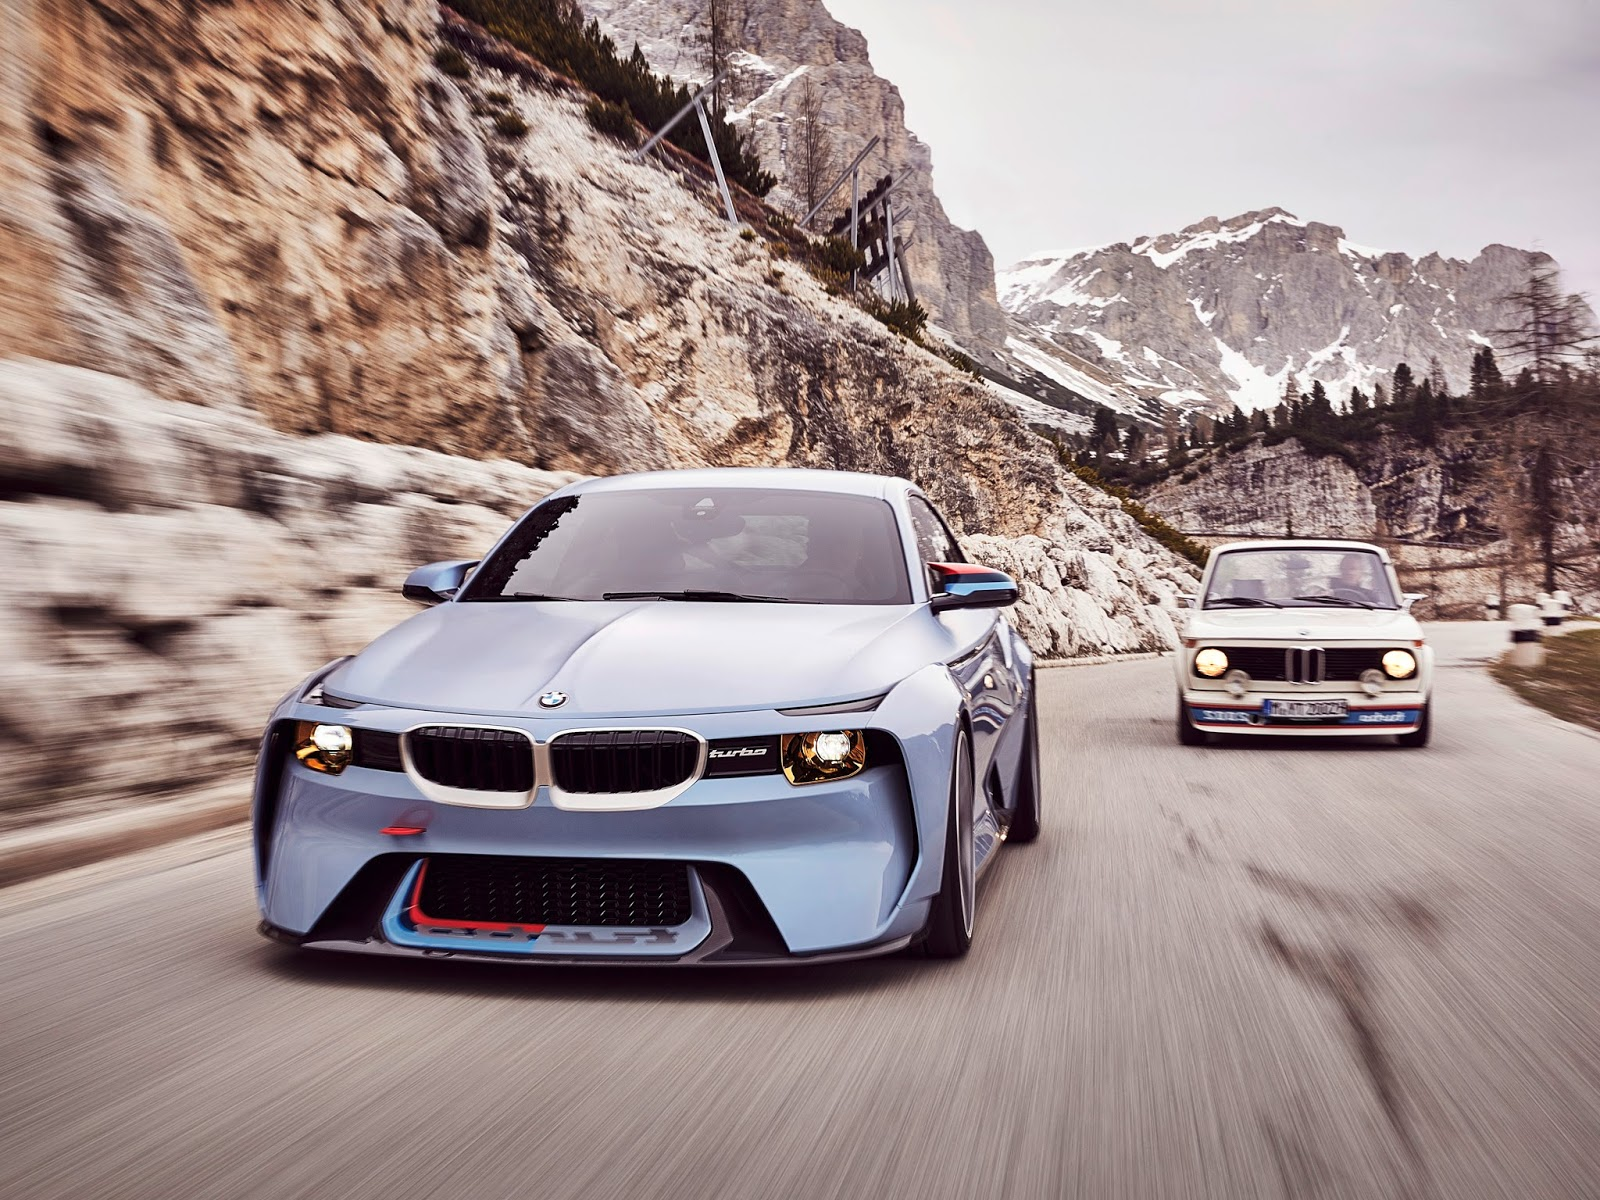 P90219729 highRes bmw 2002 hommage 05 1 1 H BMW γιορτάζει τα 50 χρόνια της θρυλικής 2002 turbo και παρουσιάζει την Bmw 2002 Hommage BMW, BMW 2002, BMW 2002 turbo, BMW Concept, BMW Hommage, supercars, videos